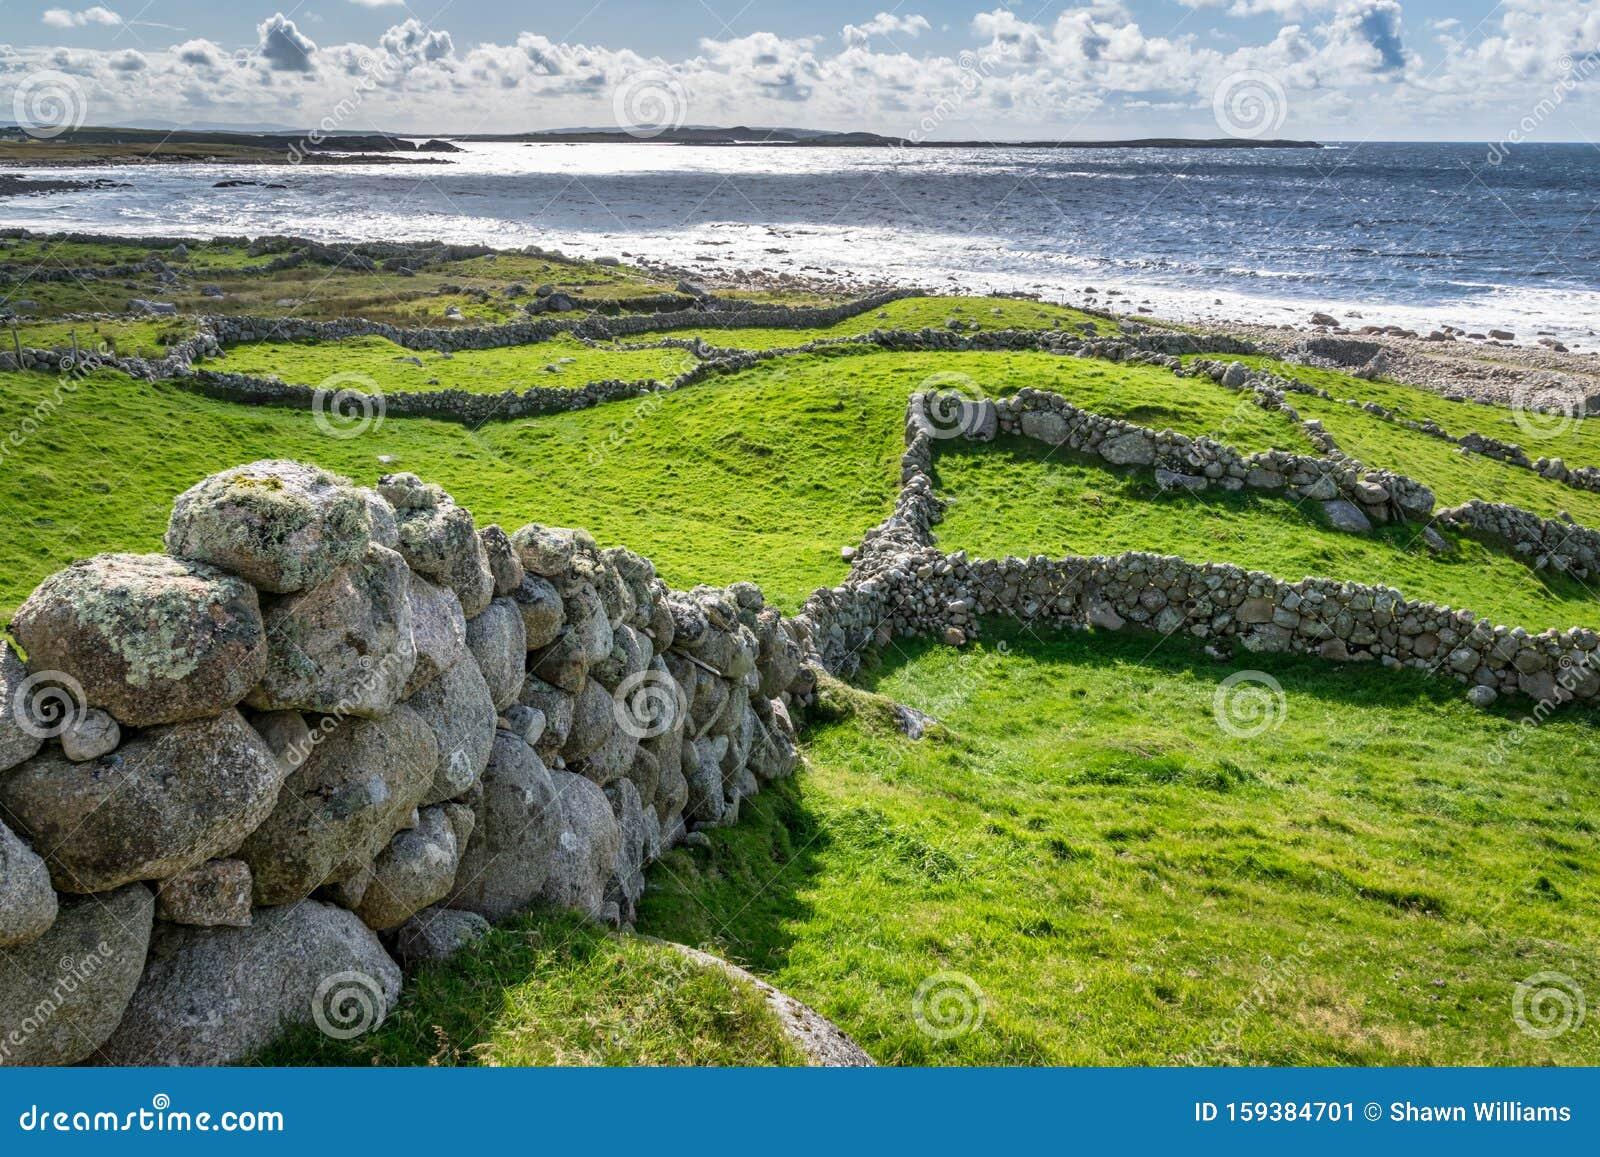 old-stone-wall-walls-atlantic-ocean-doen